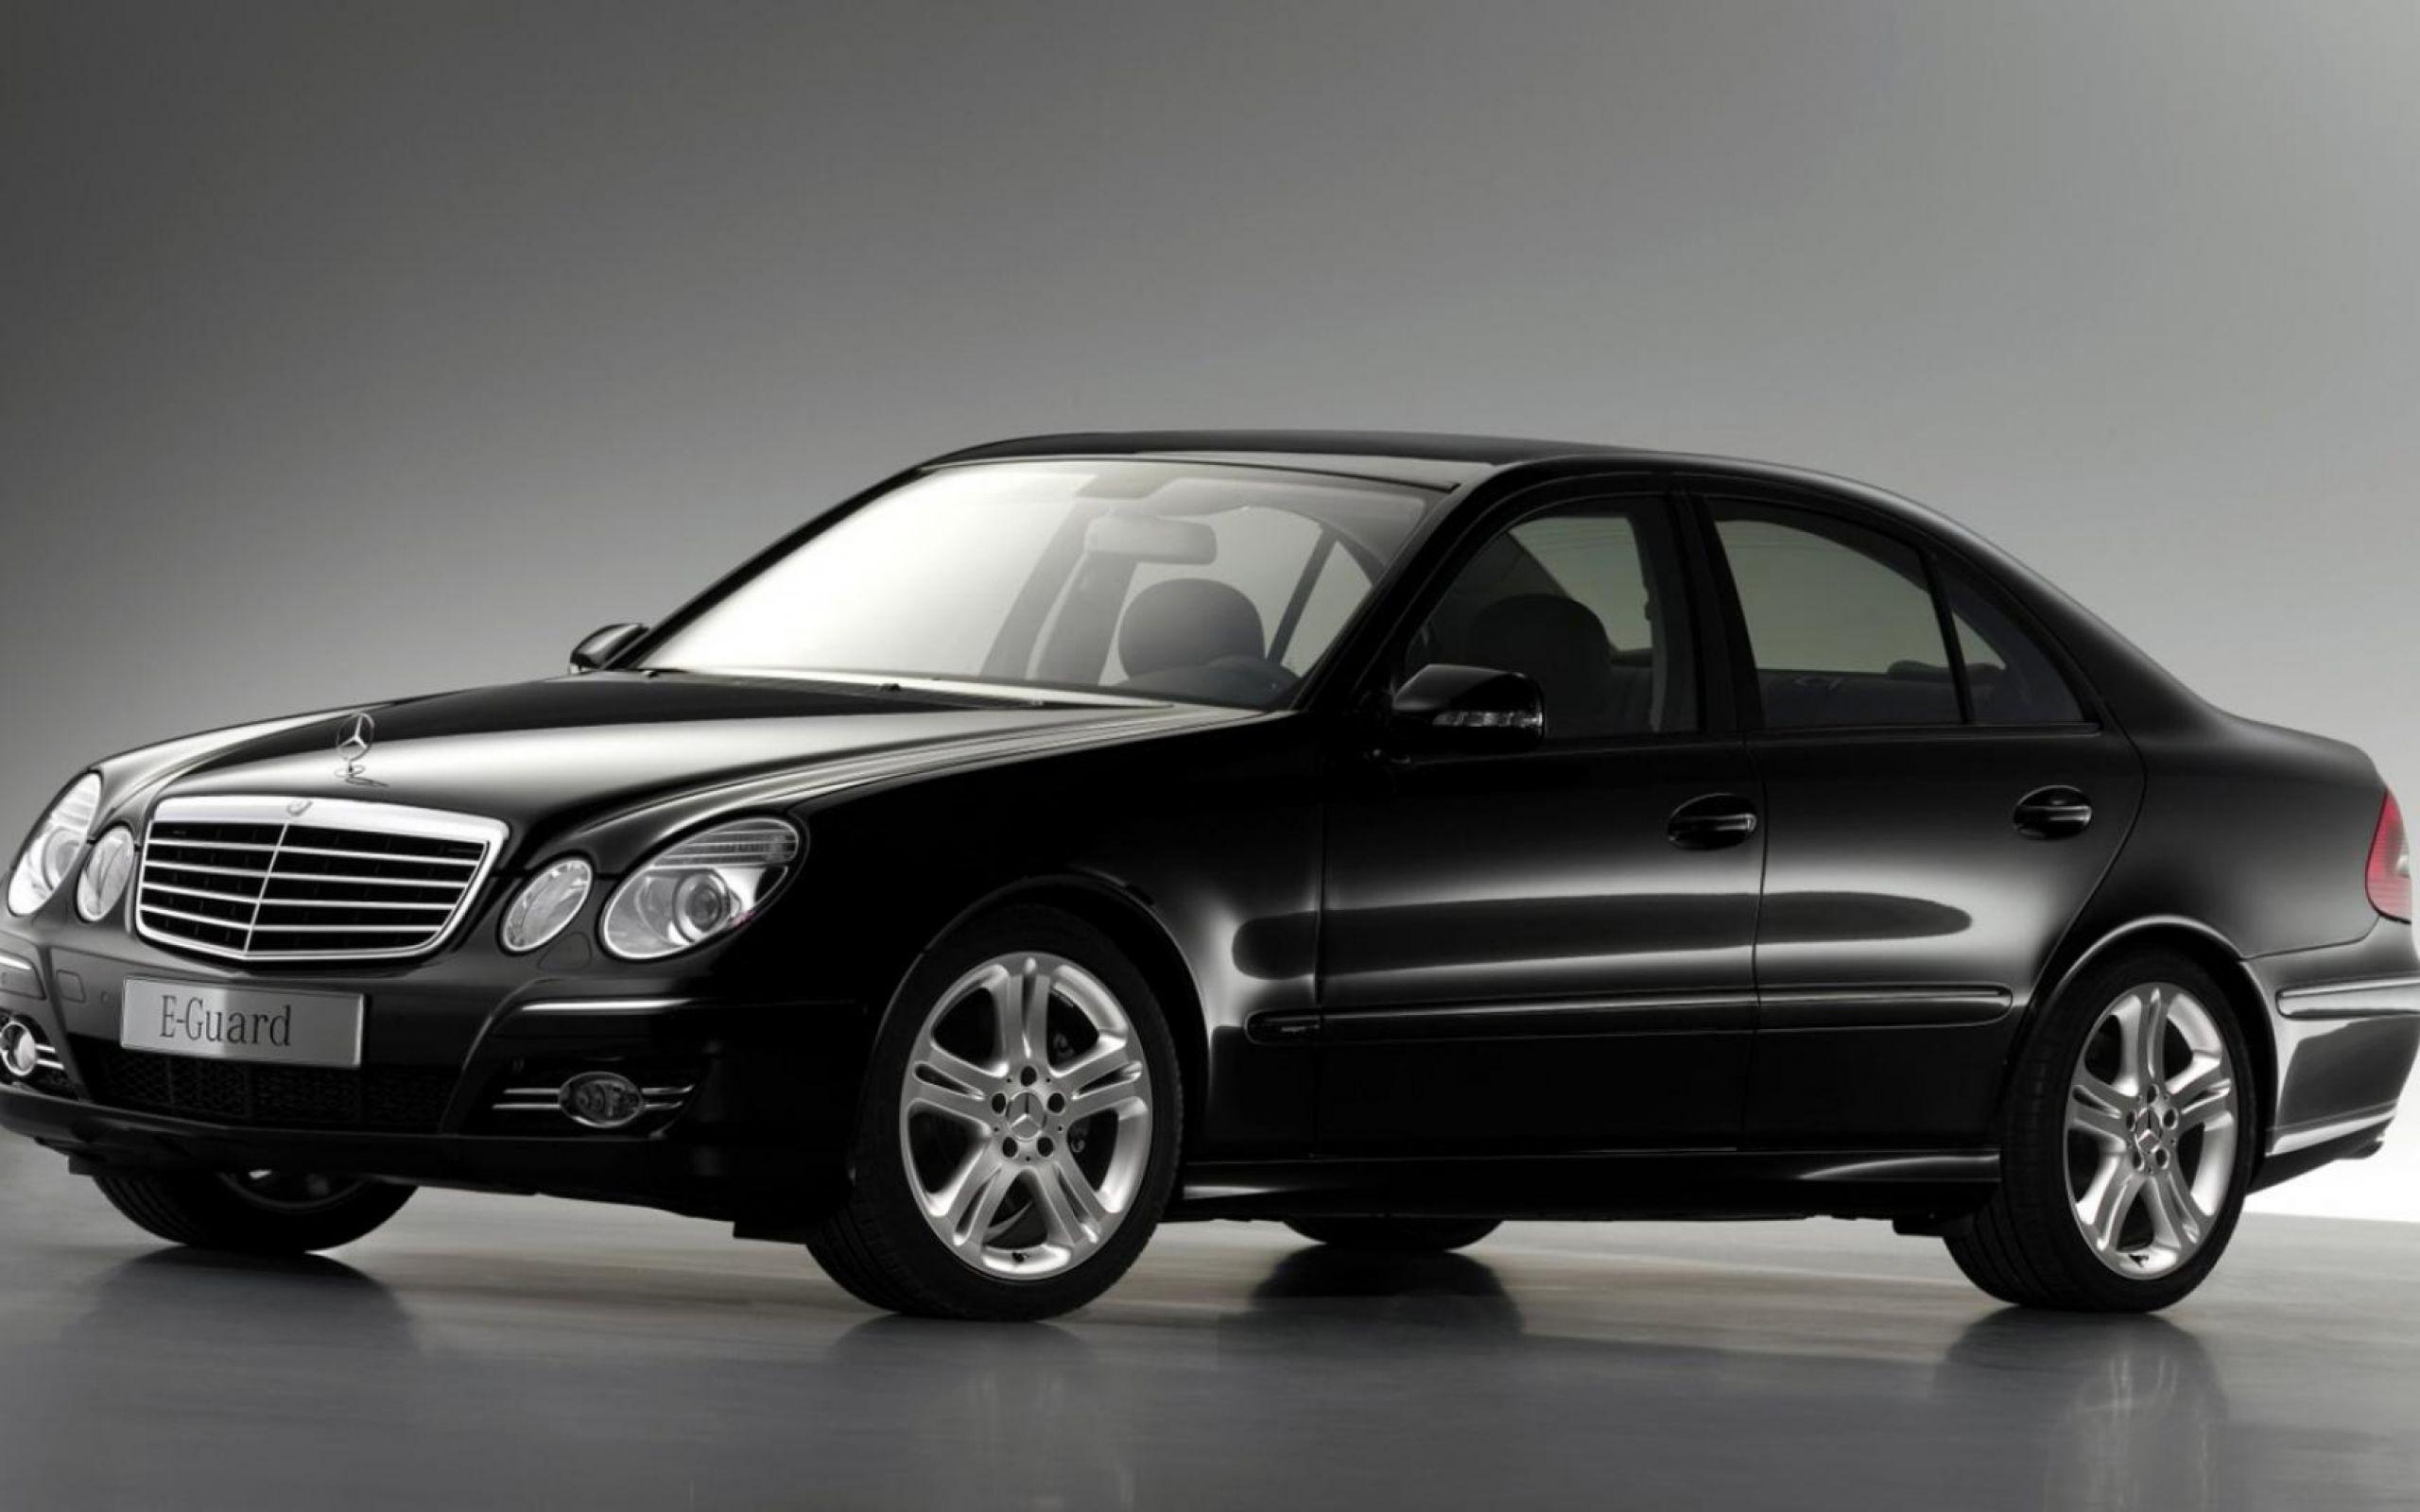 Что происходит при сбое системы SBC в Mercedes E-Class (W211)